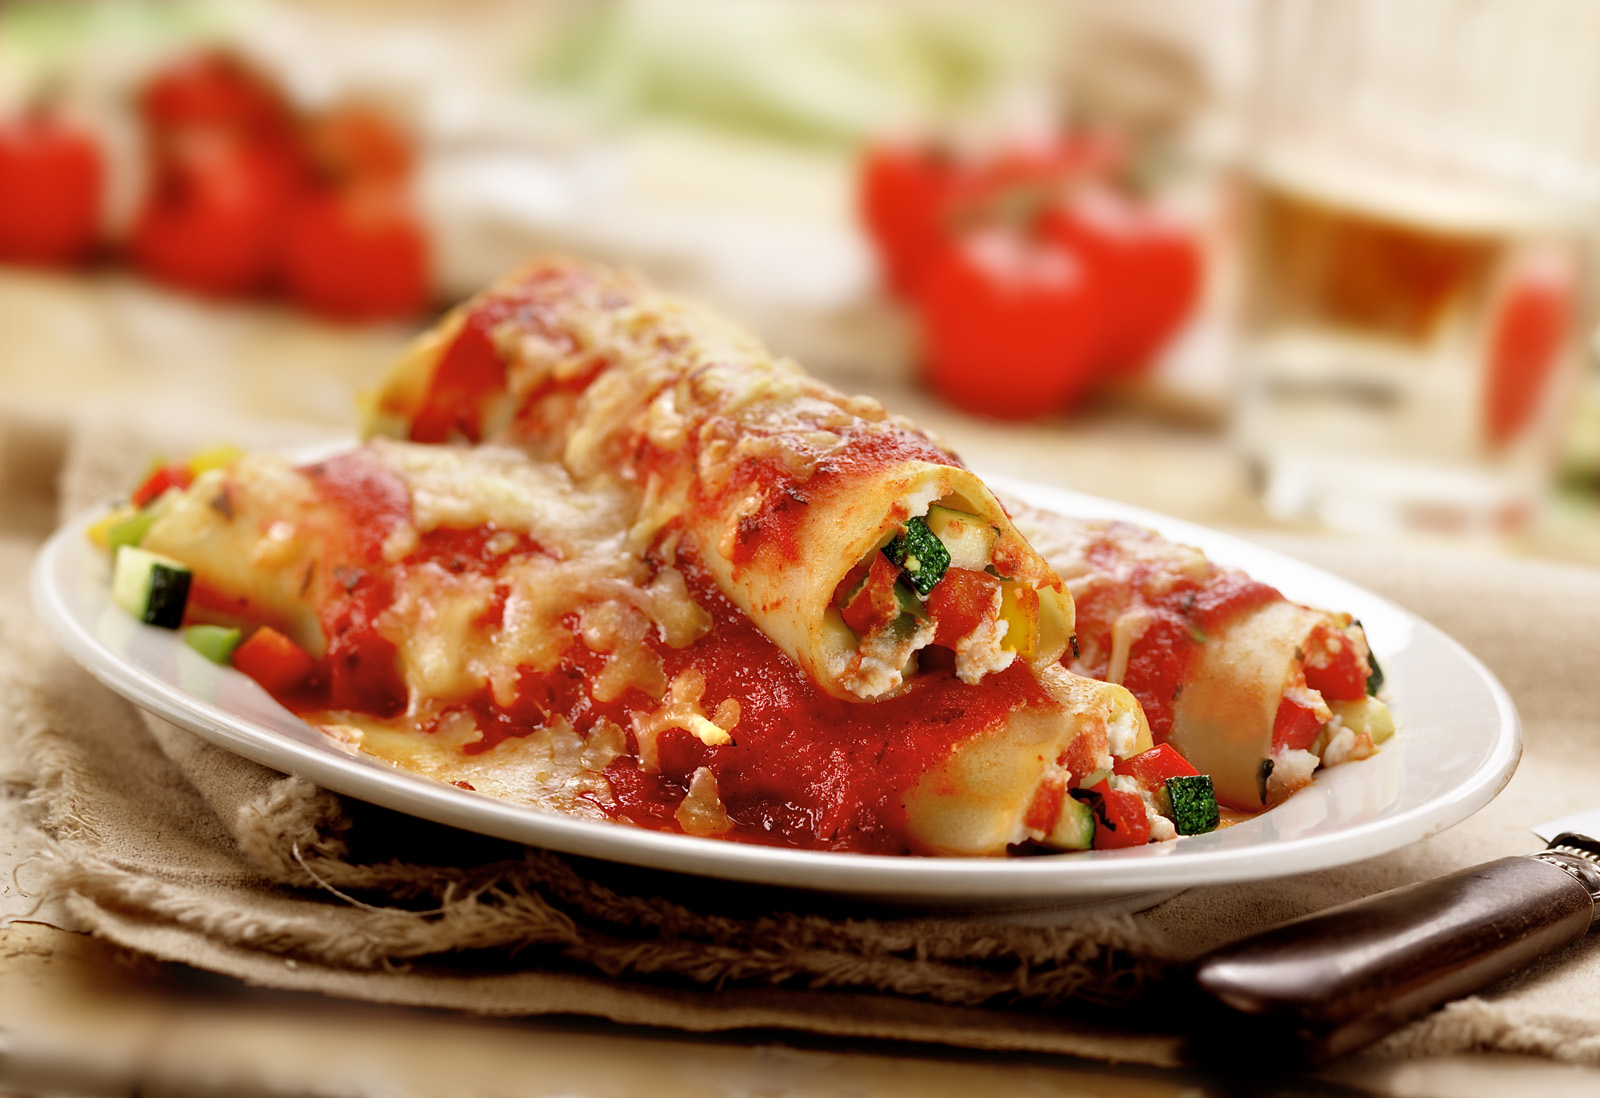 Cannelloni gevuld met courgette, paprika, basilicum en ricotta